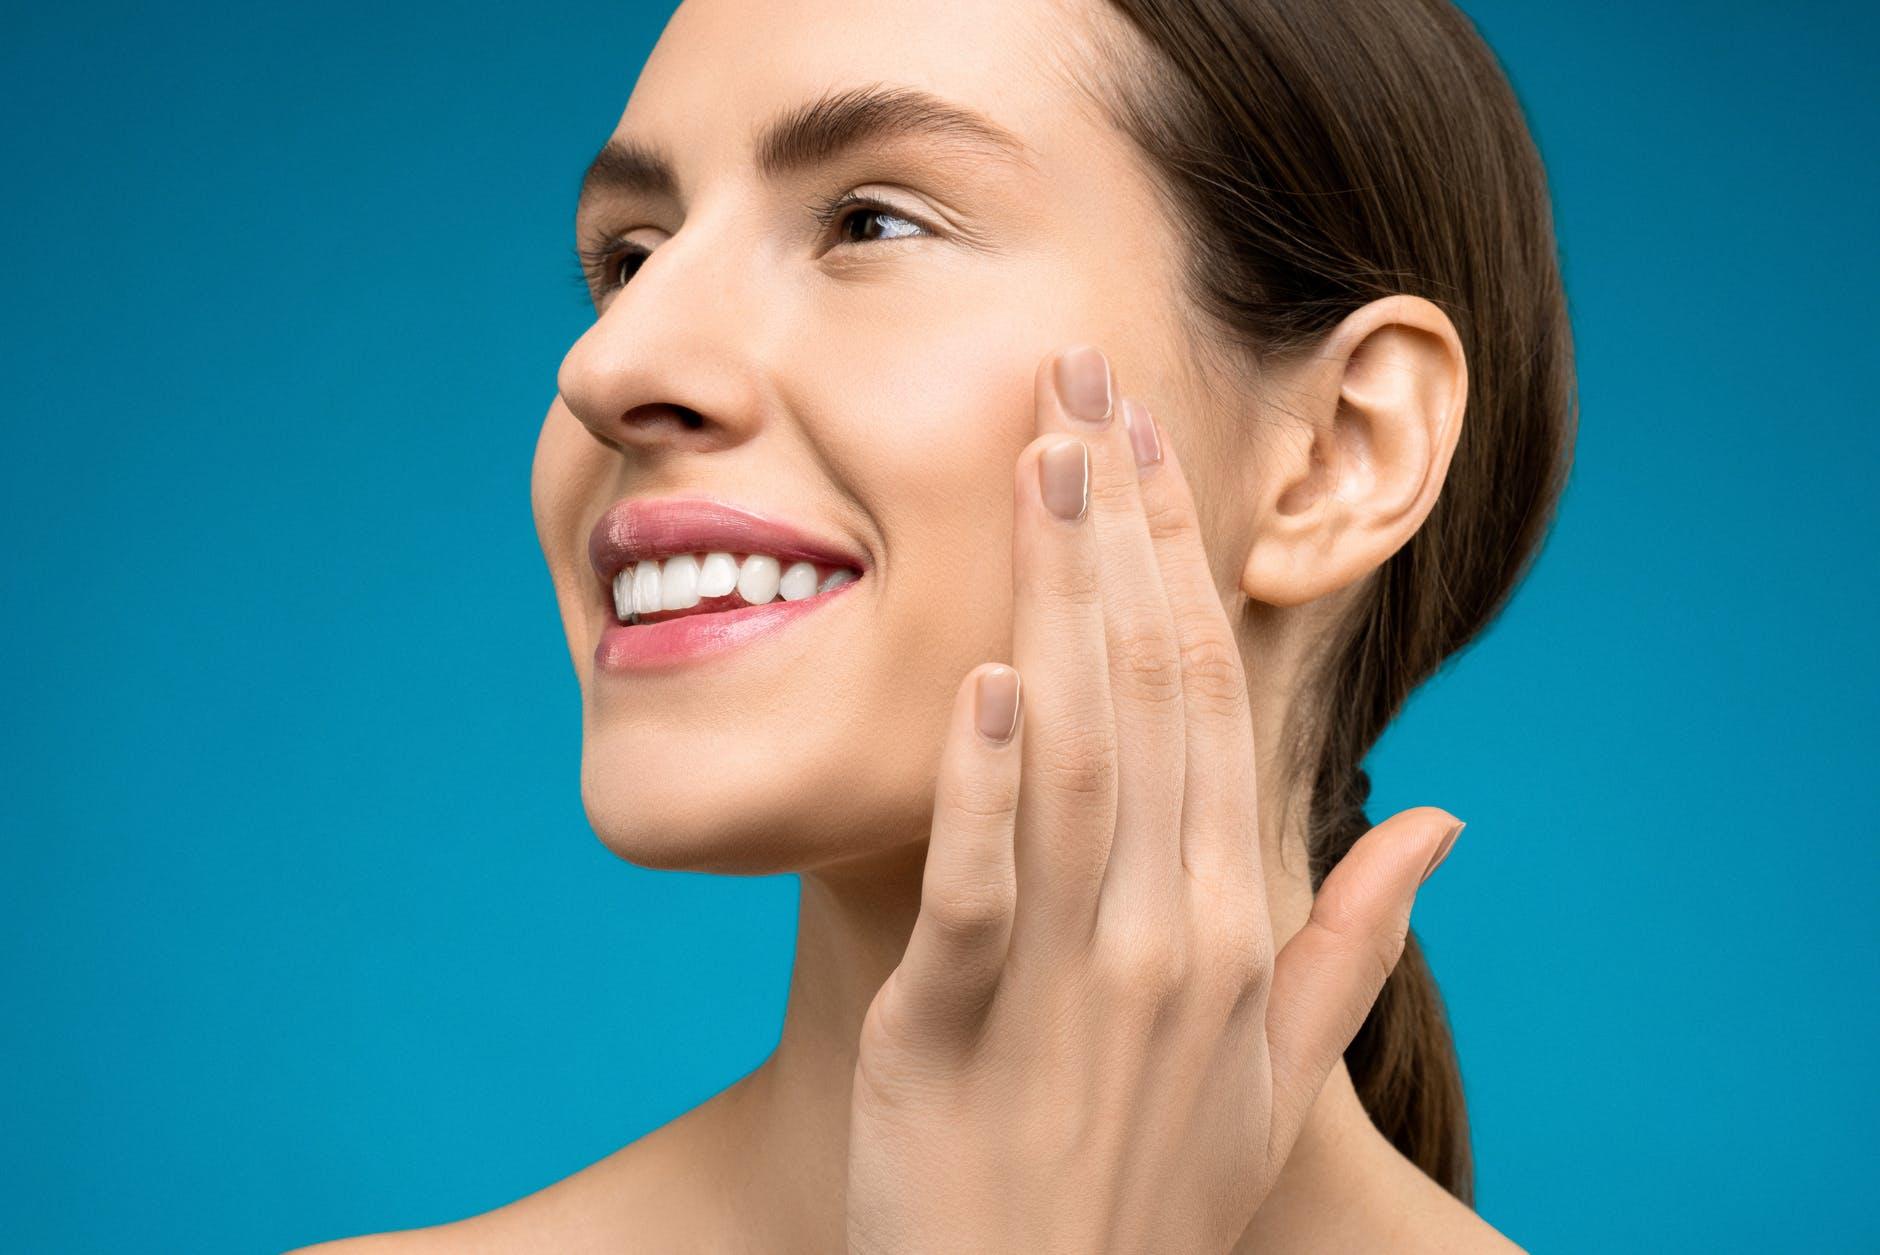 Tips Merawat Gigi Agar Terhindar Dari Karang Gigi